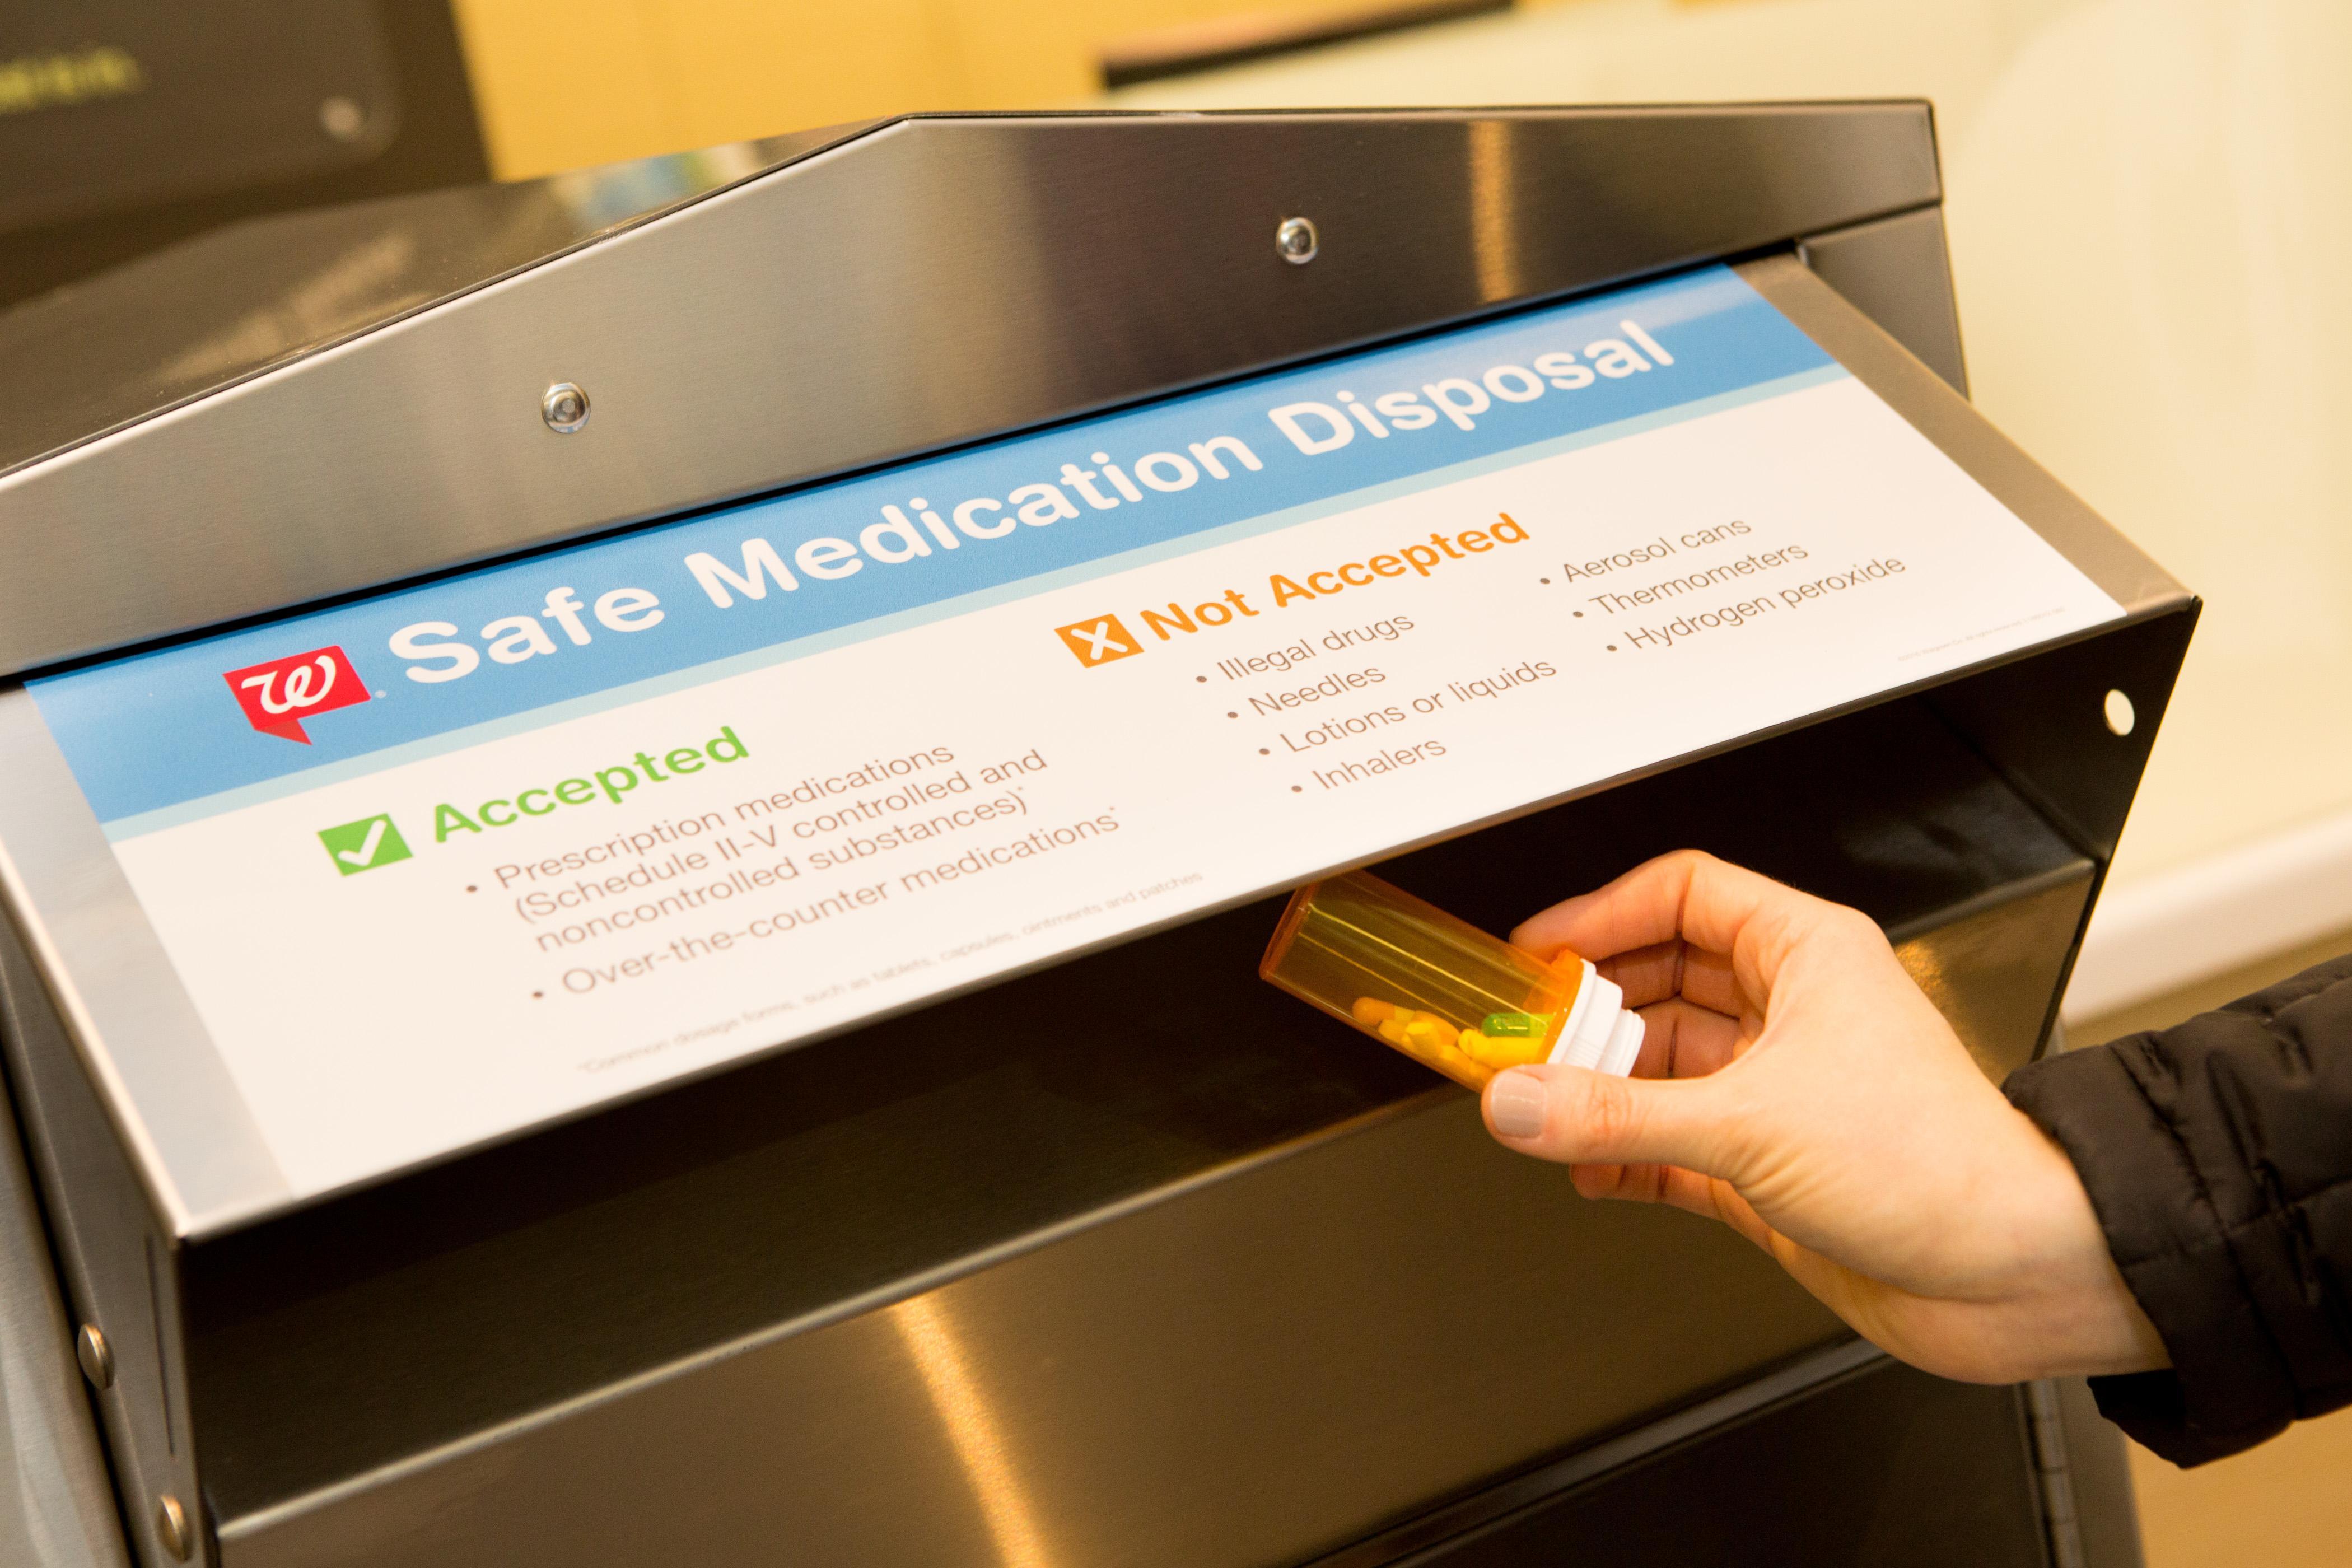 safe medication disposal kiosks will soon be available at 10 walgreens stores in washington - Walgreens Prescription Card